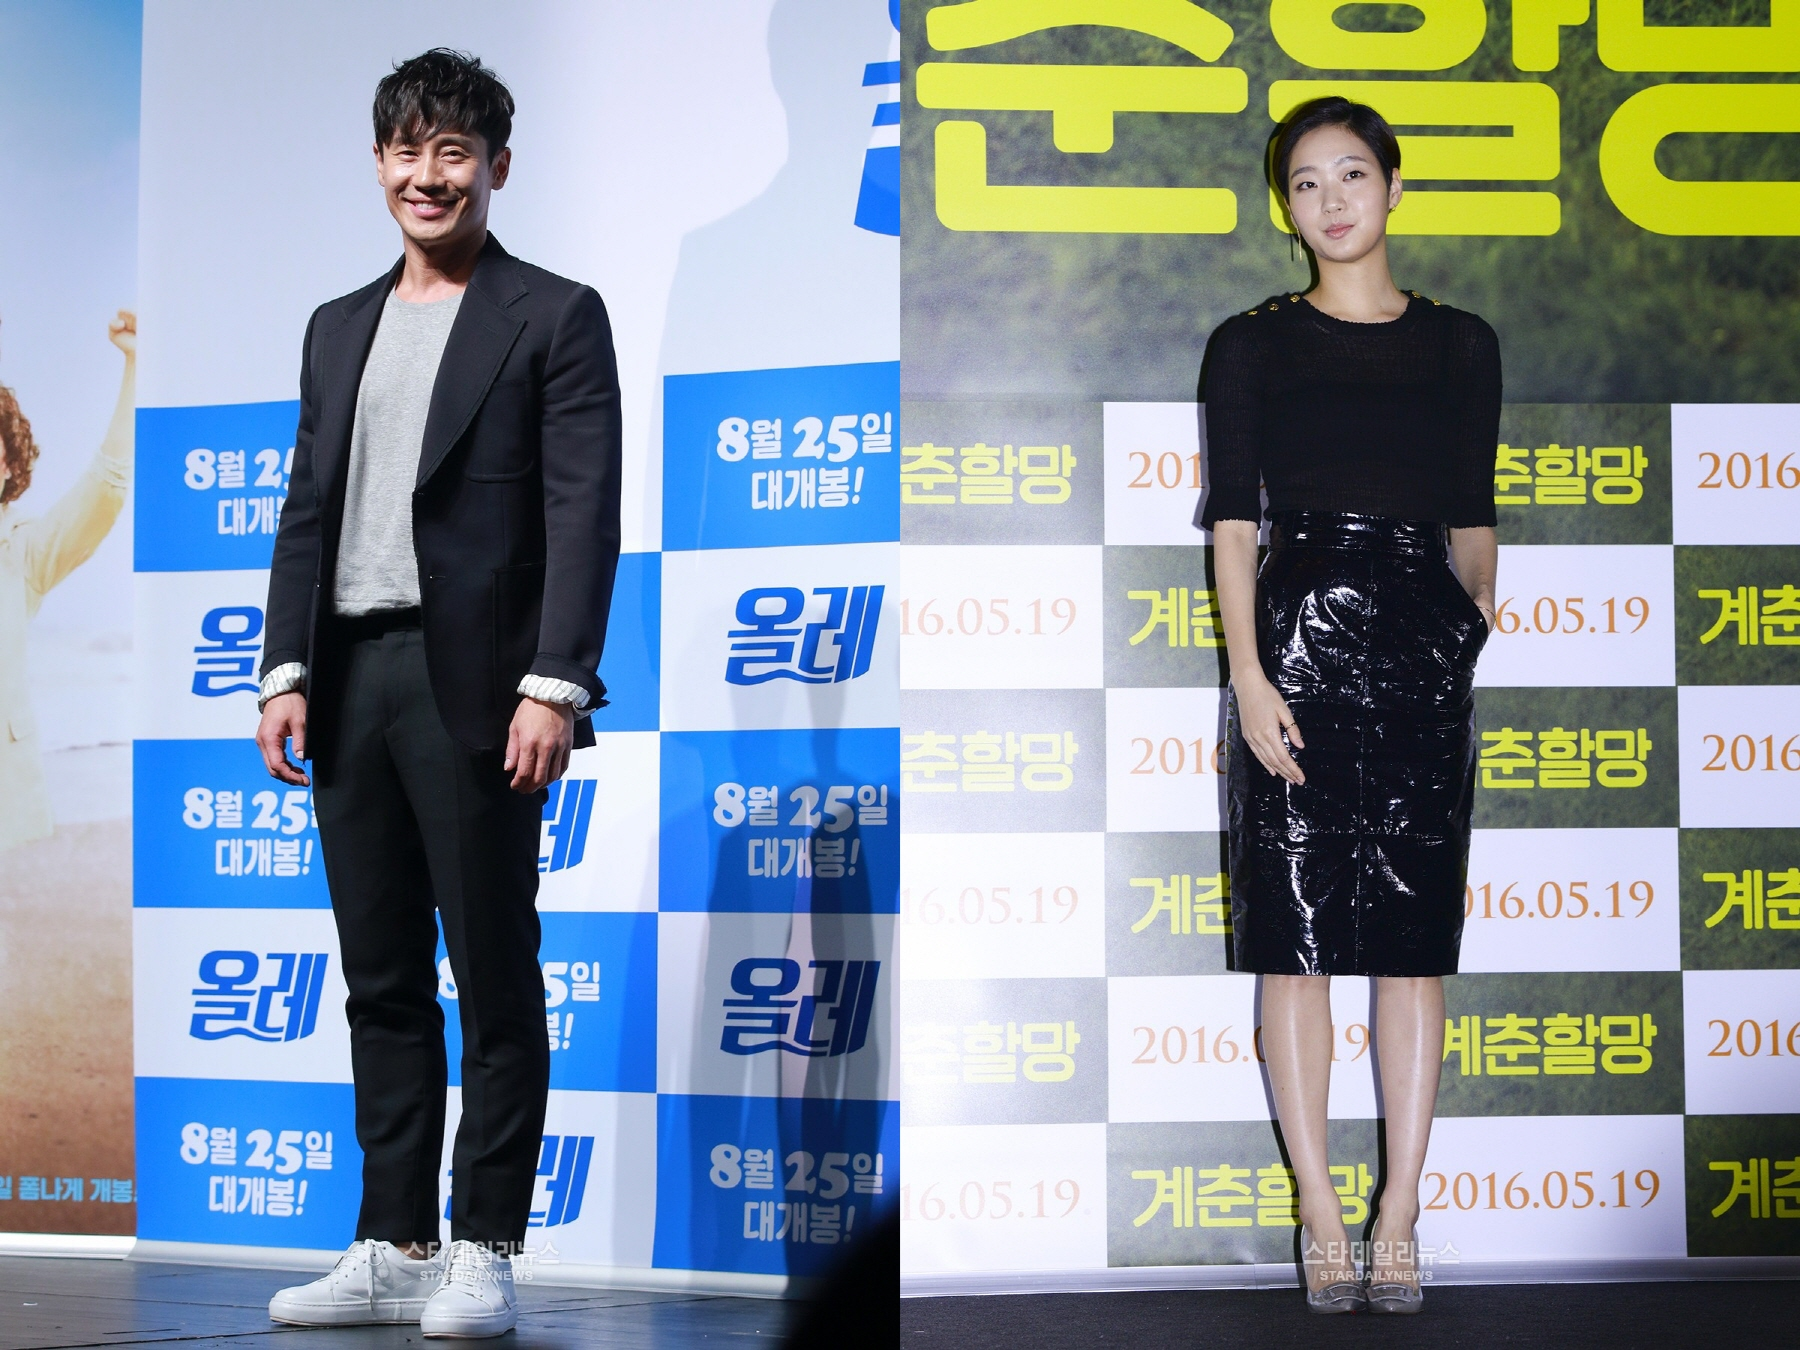 Old Photos Of Shin Ha Kyun And Kim Go Eun Resurface After Dating Announcement